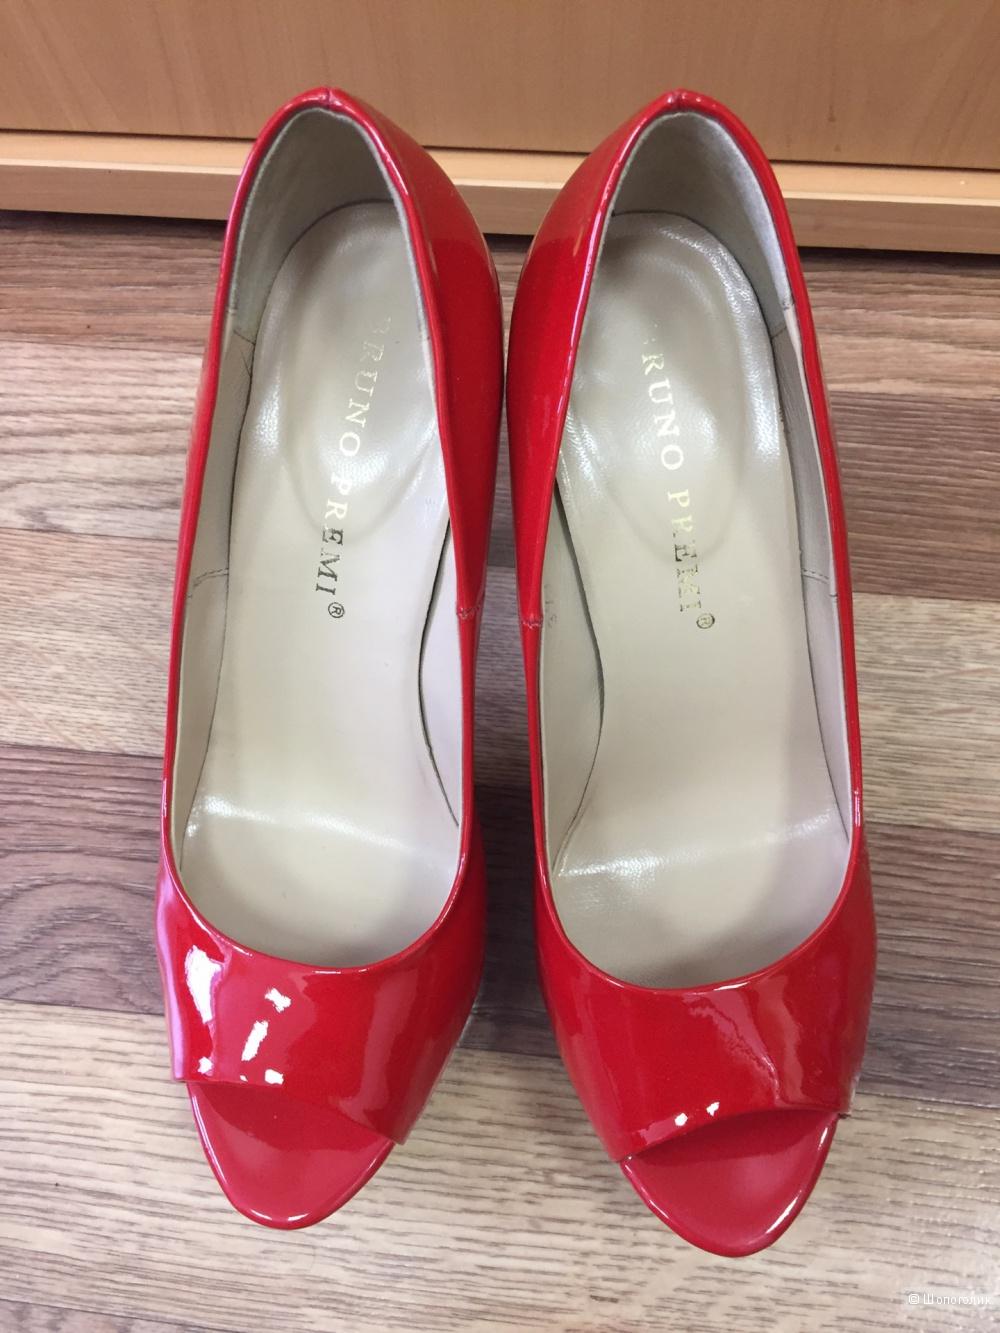 Красные туфли-лодочки Bruno Premi Италия оригинал нат. кожа 37 евро б.у 1 раз